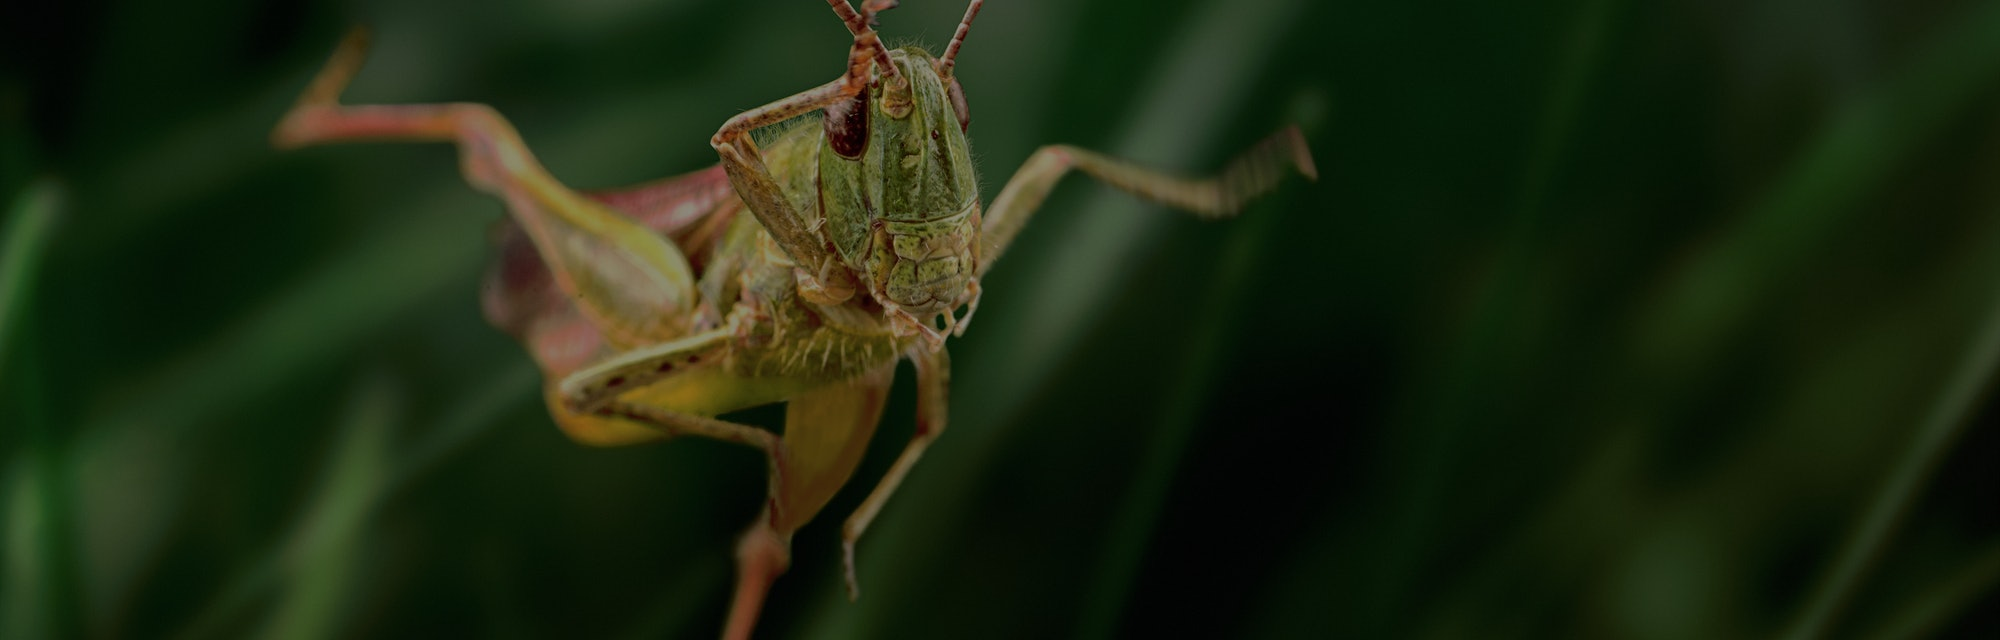 Grasshopper jump close up, insect macro